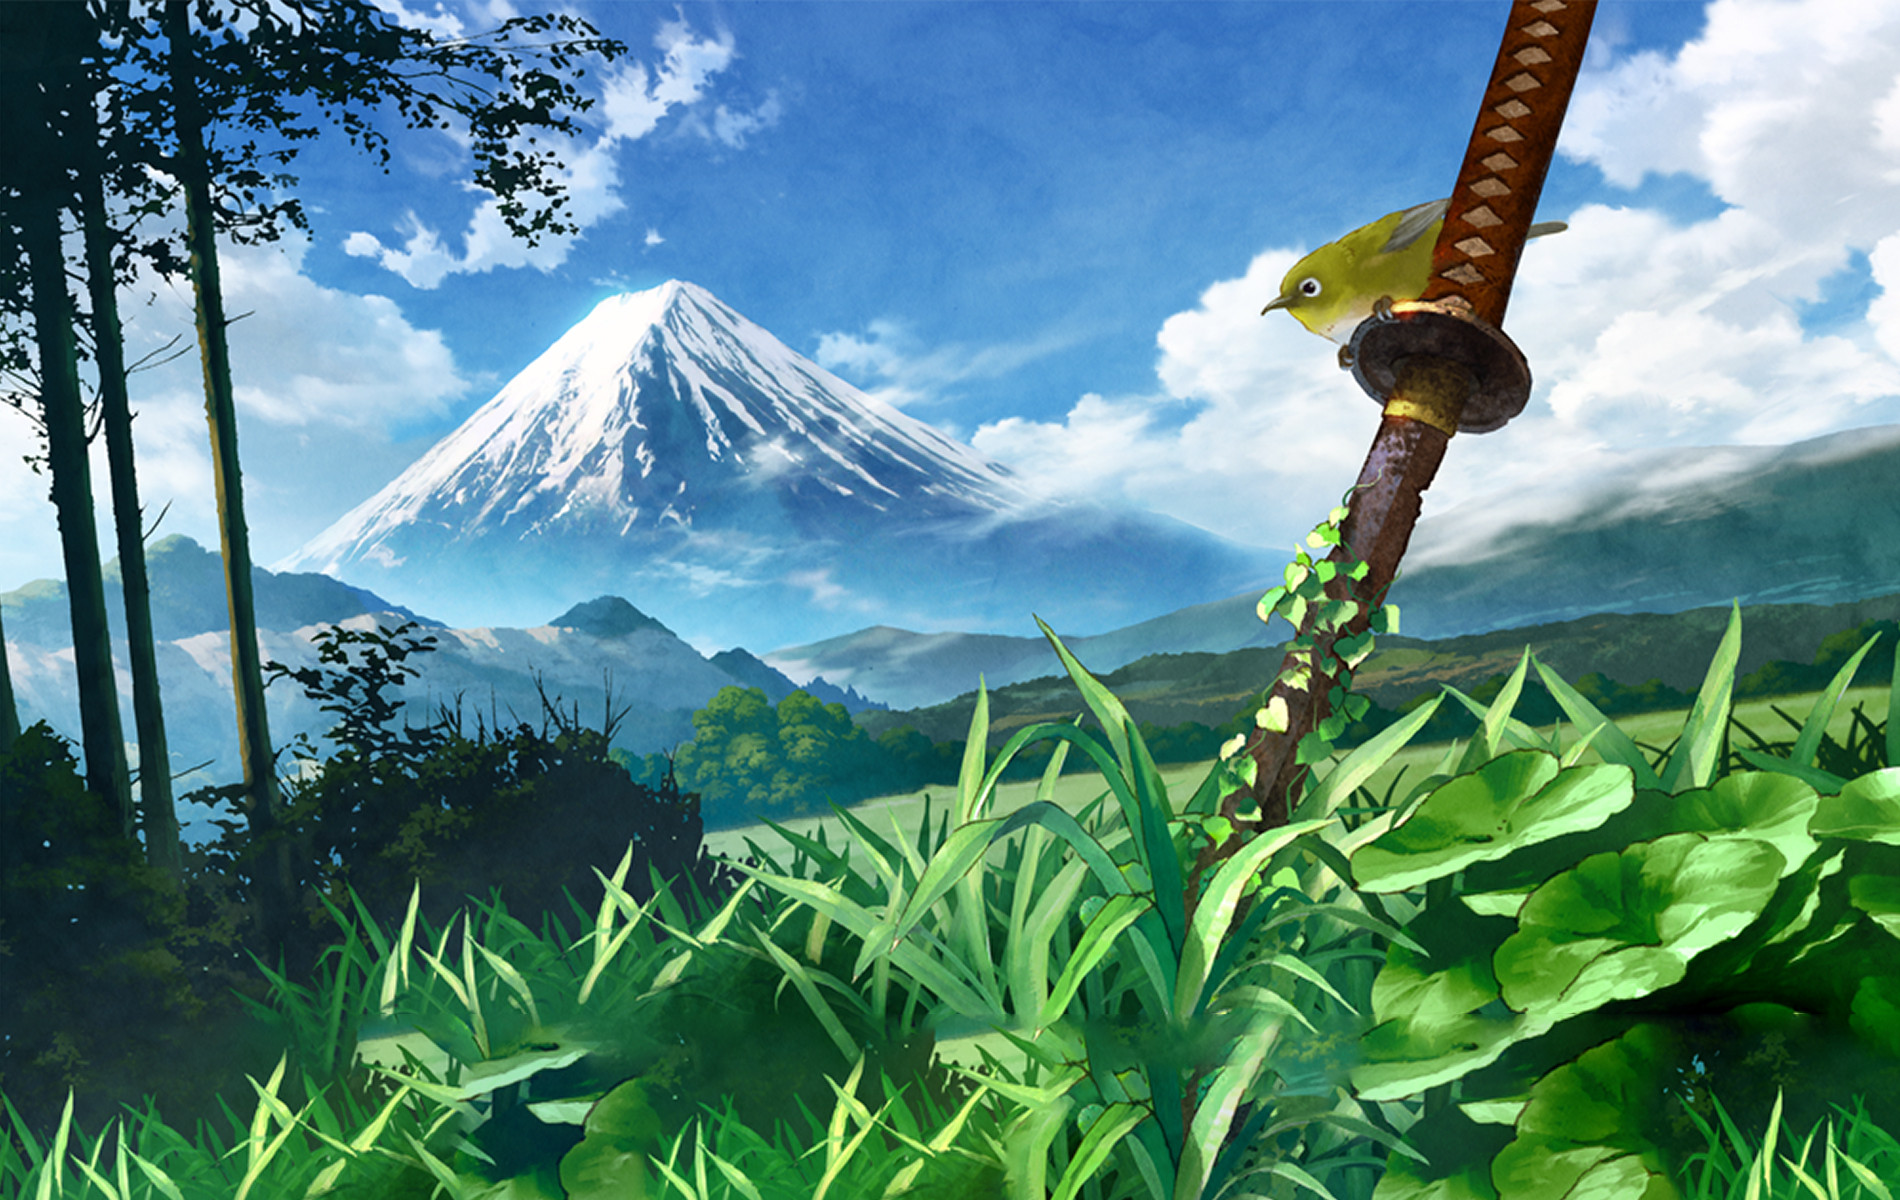 Anime Landscape Wallpaper HD 1900x1200